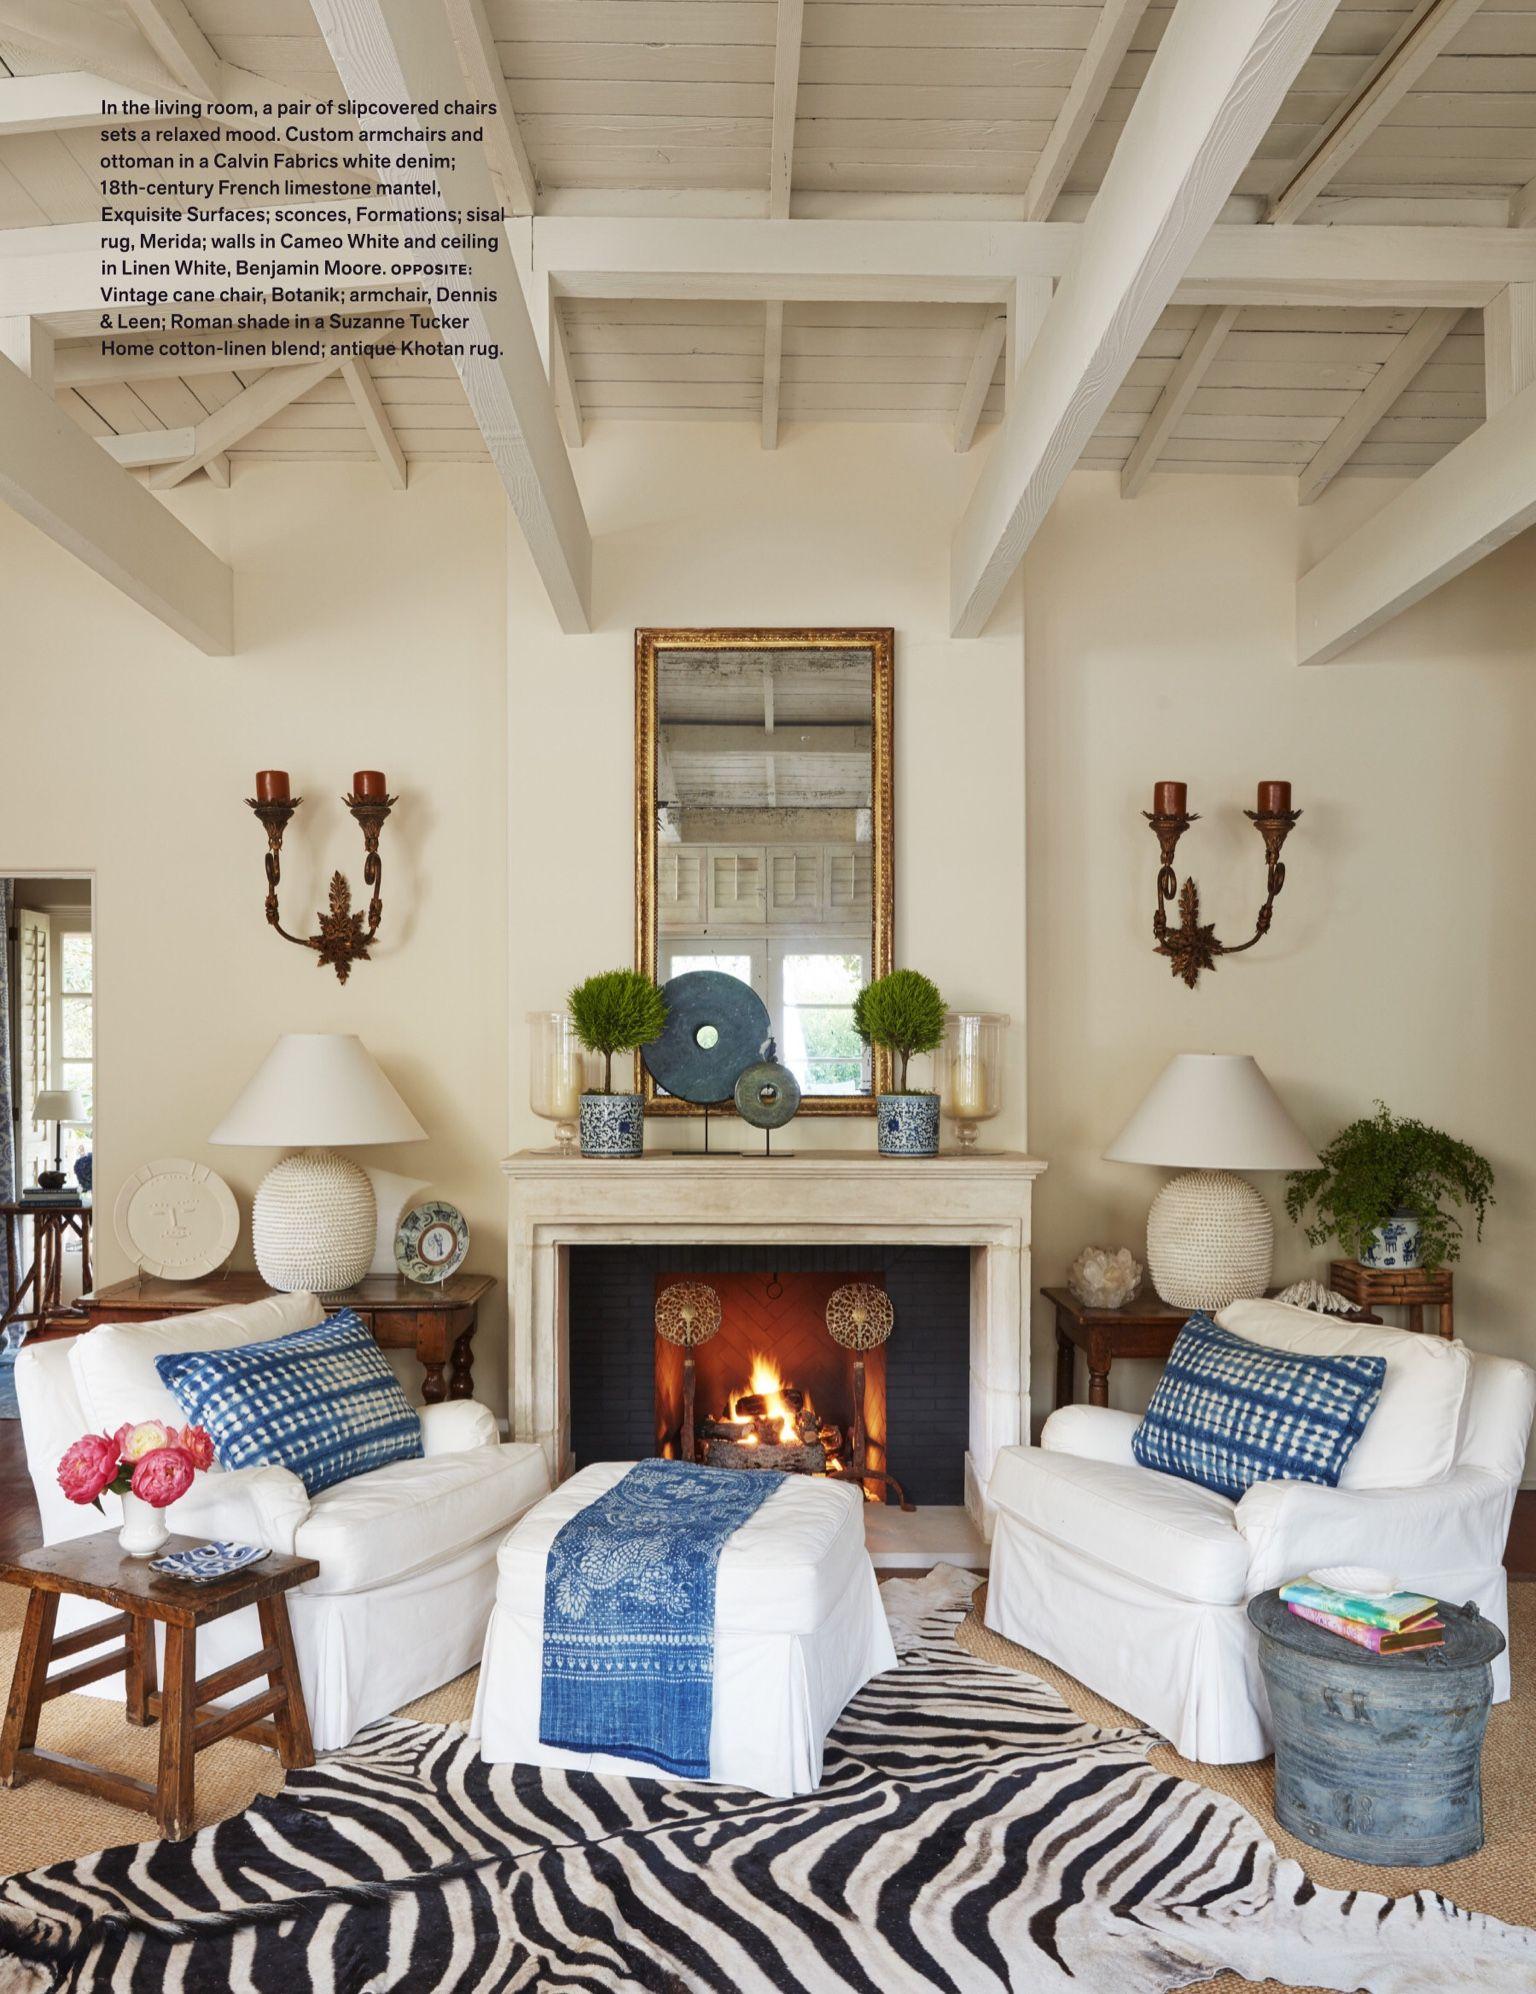 mar/apr 2017 issue of verandamag  living room designs